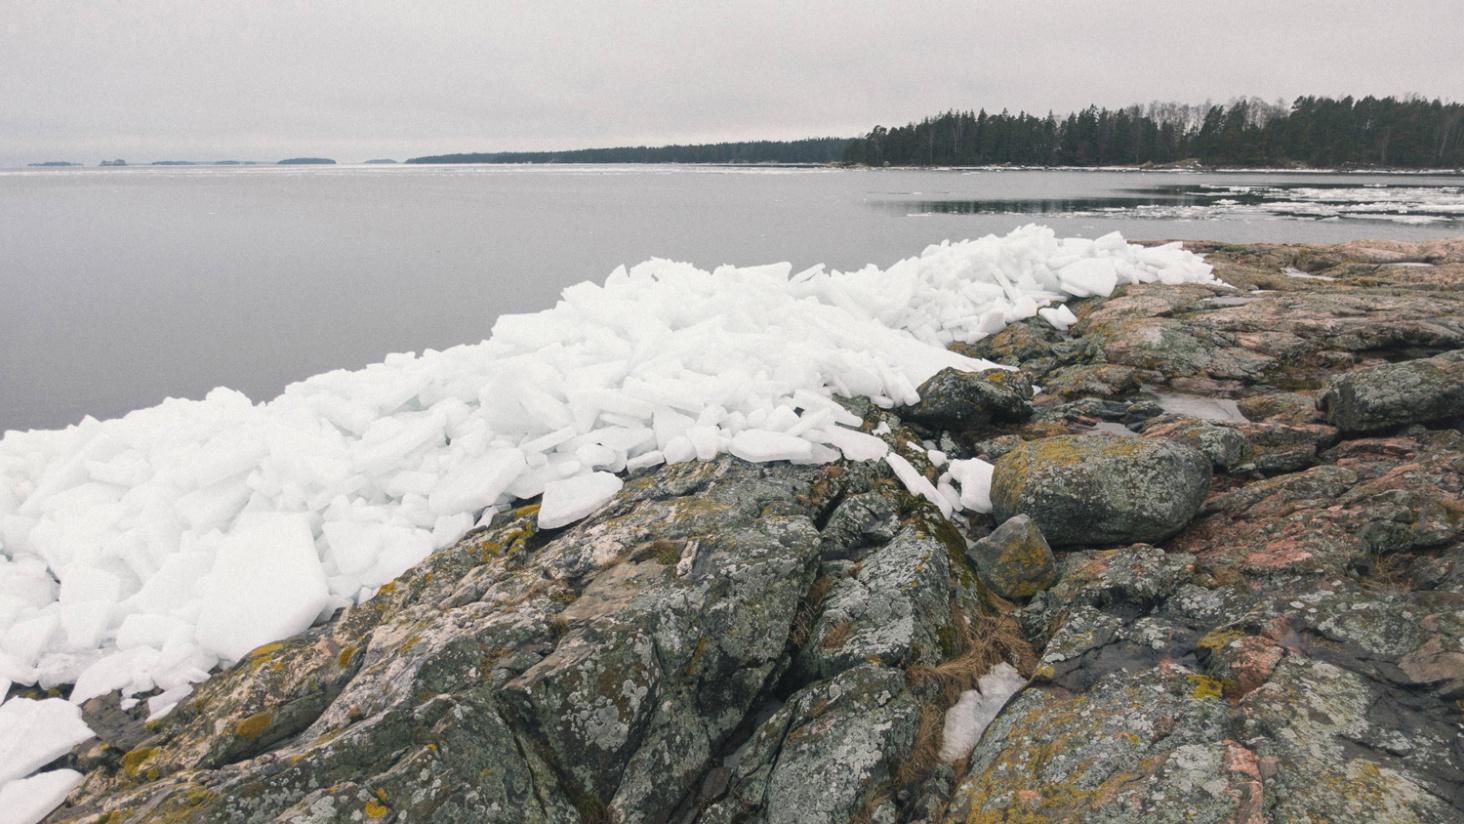 18 Robin Falck Finnland Kajak